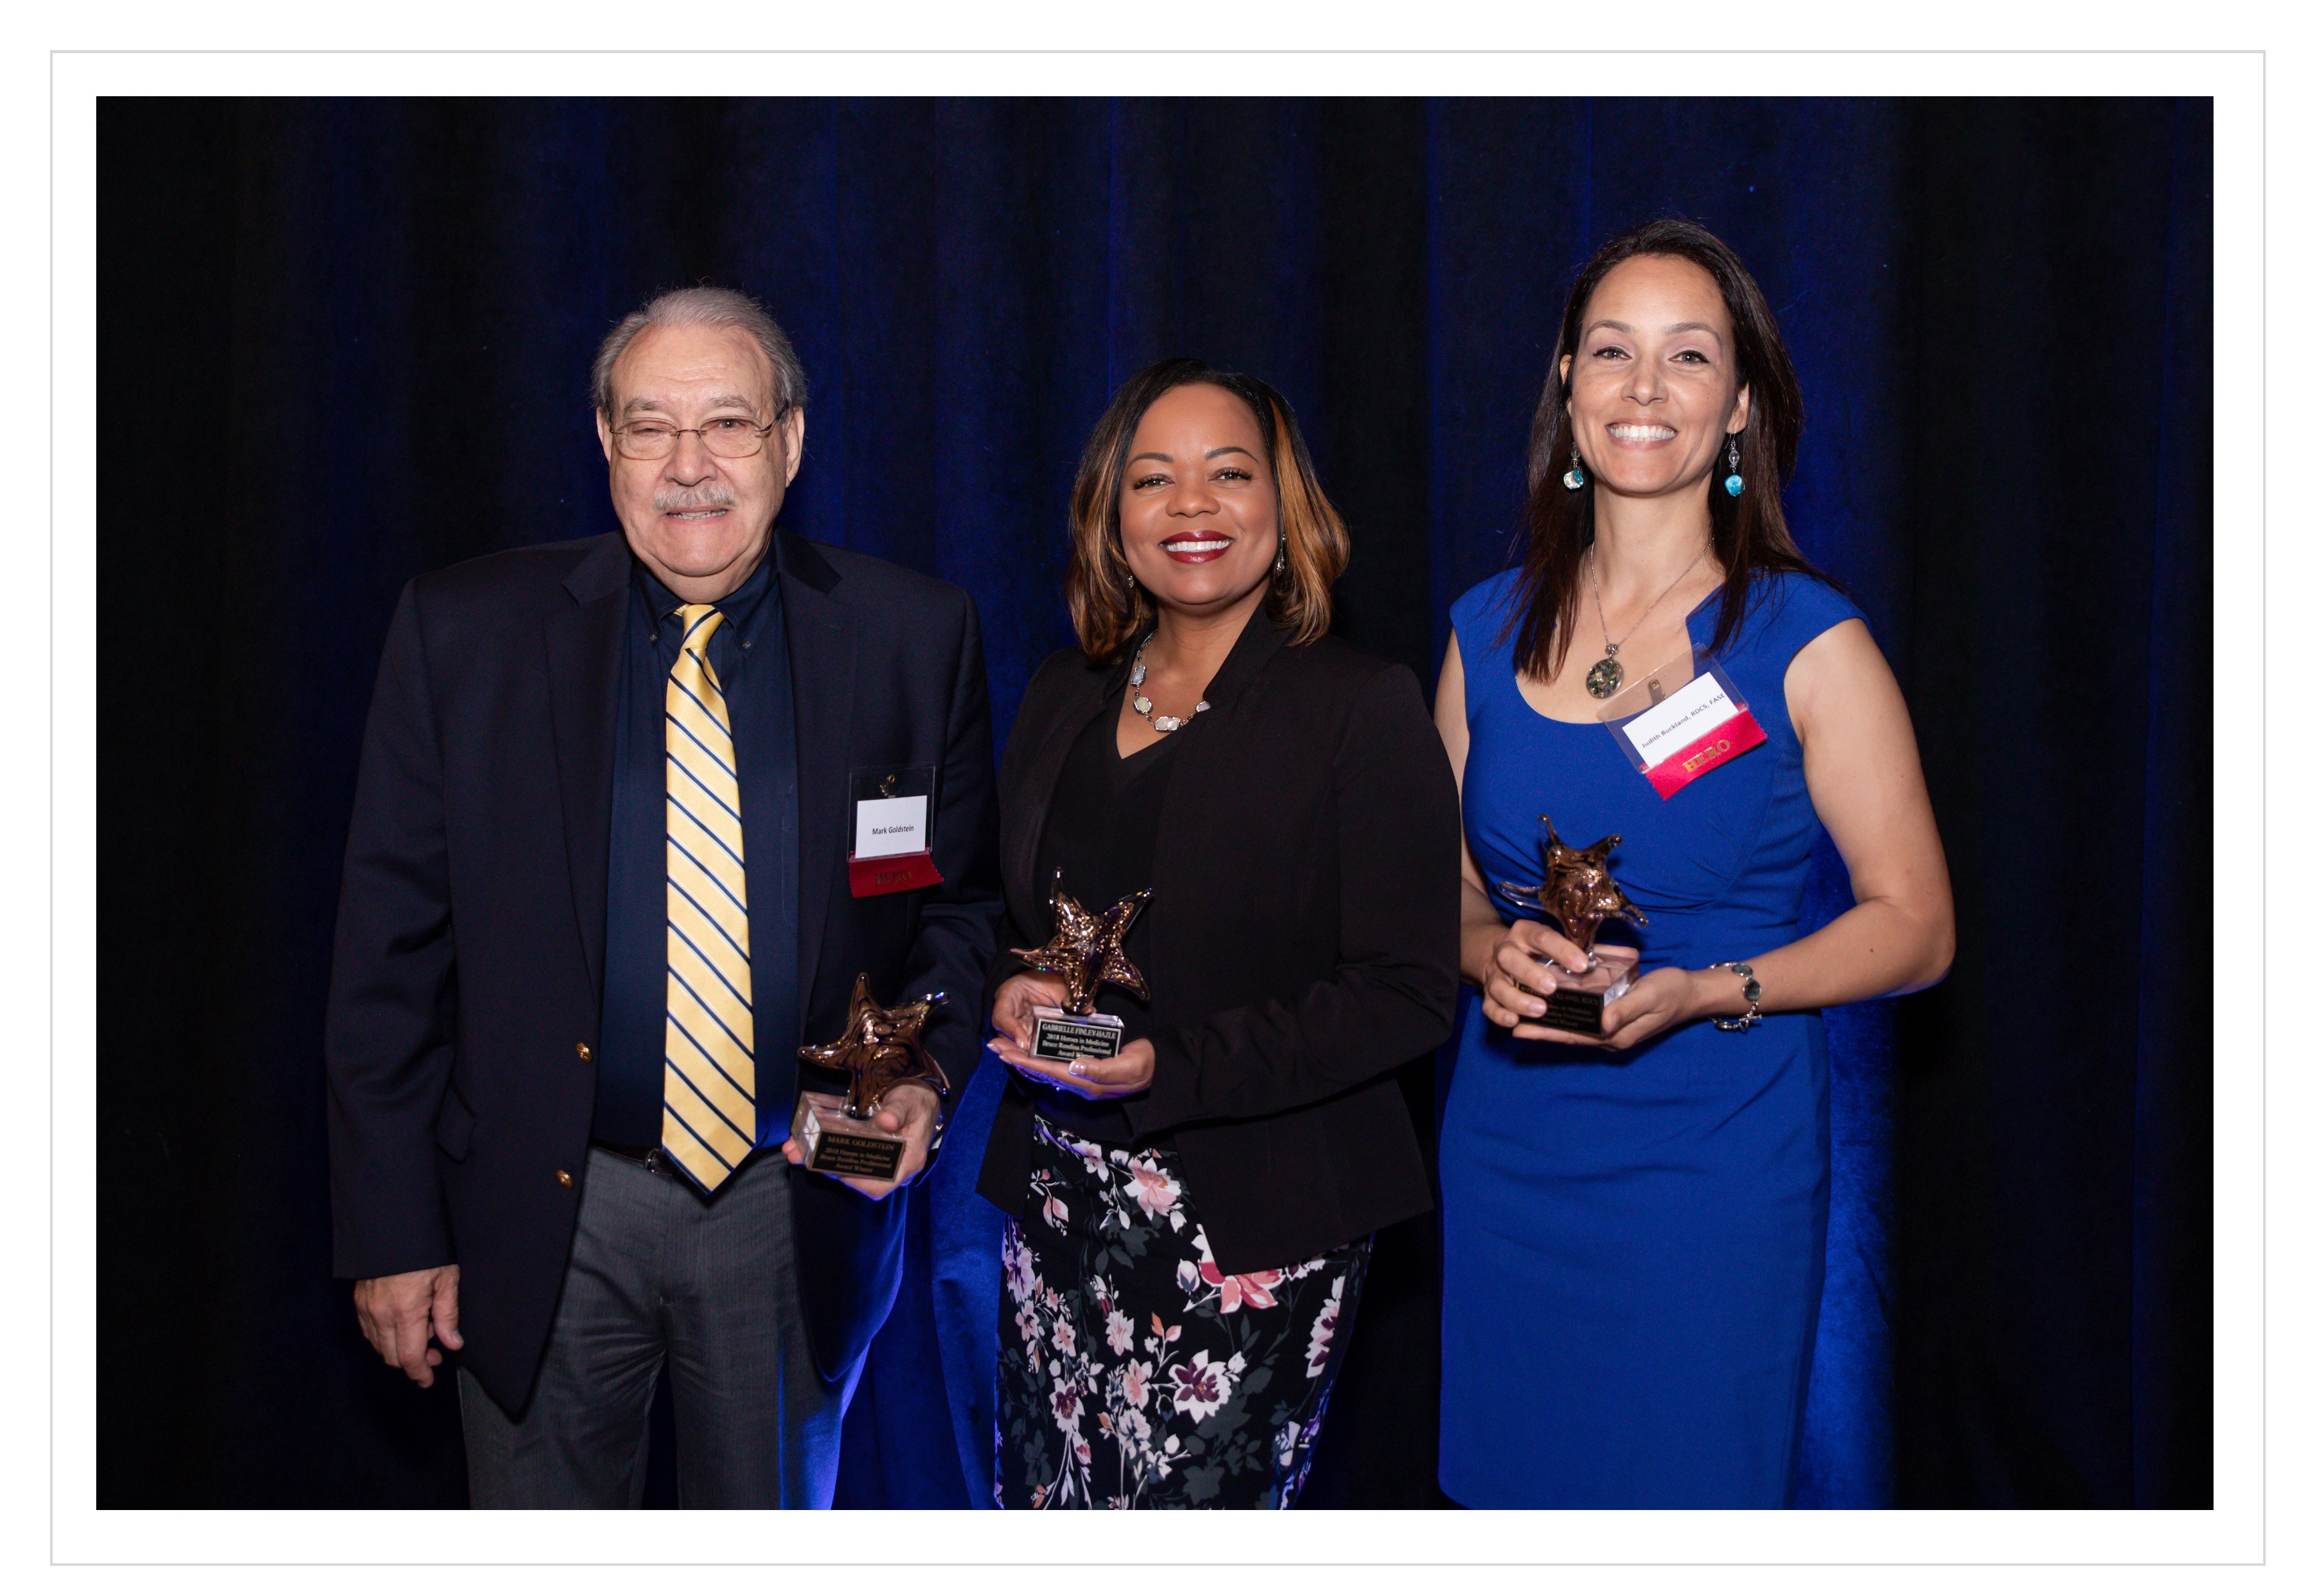 PBCMS Hero in Medicine Award: Bruce Rendina Award